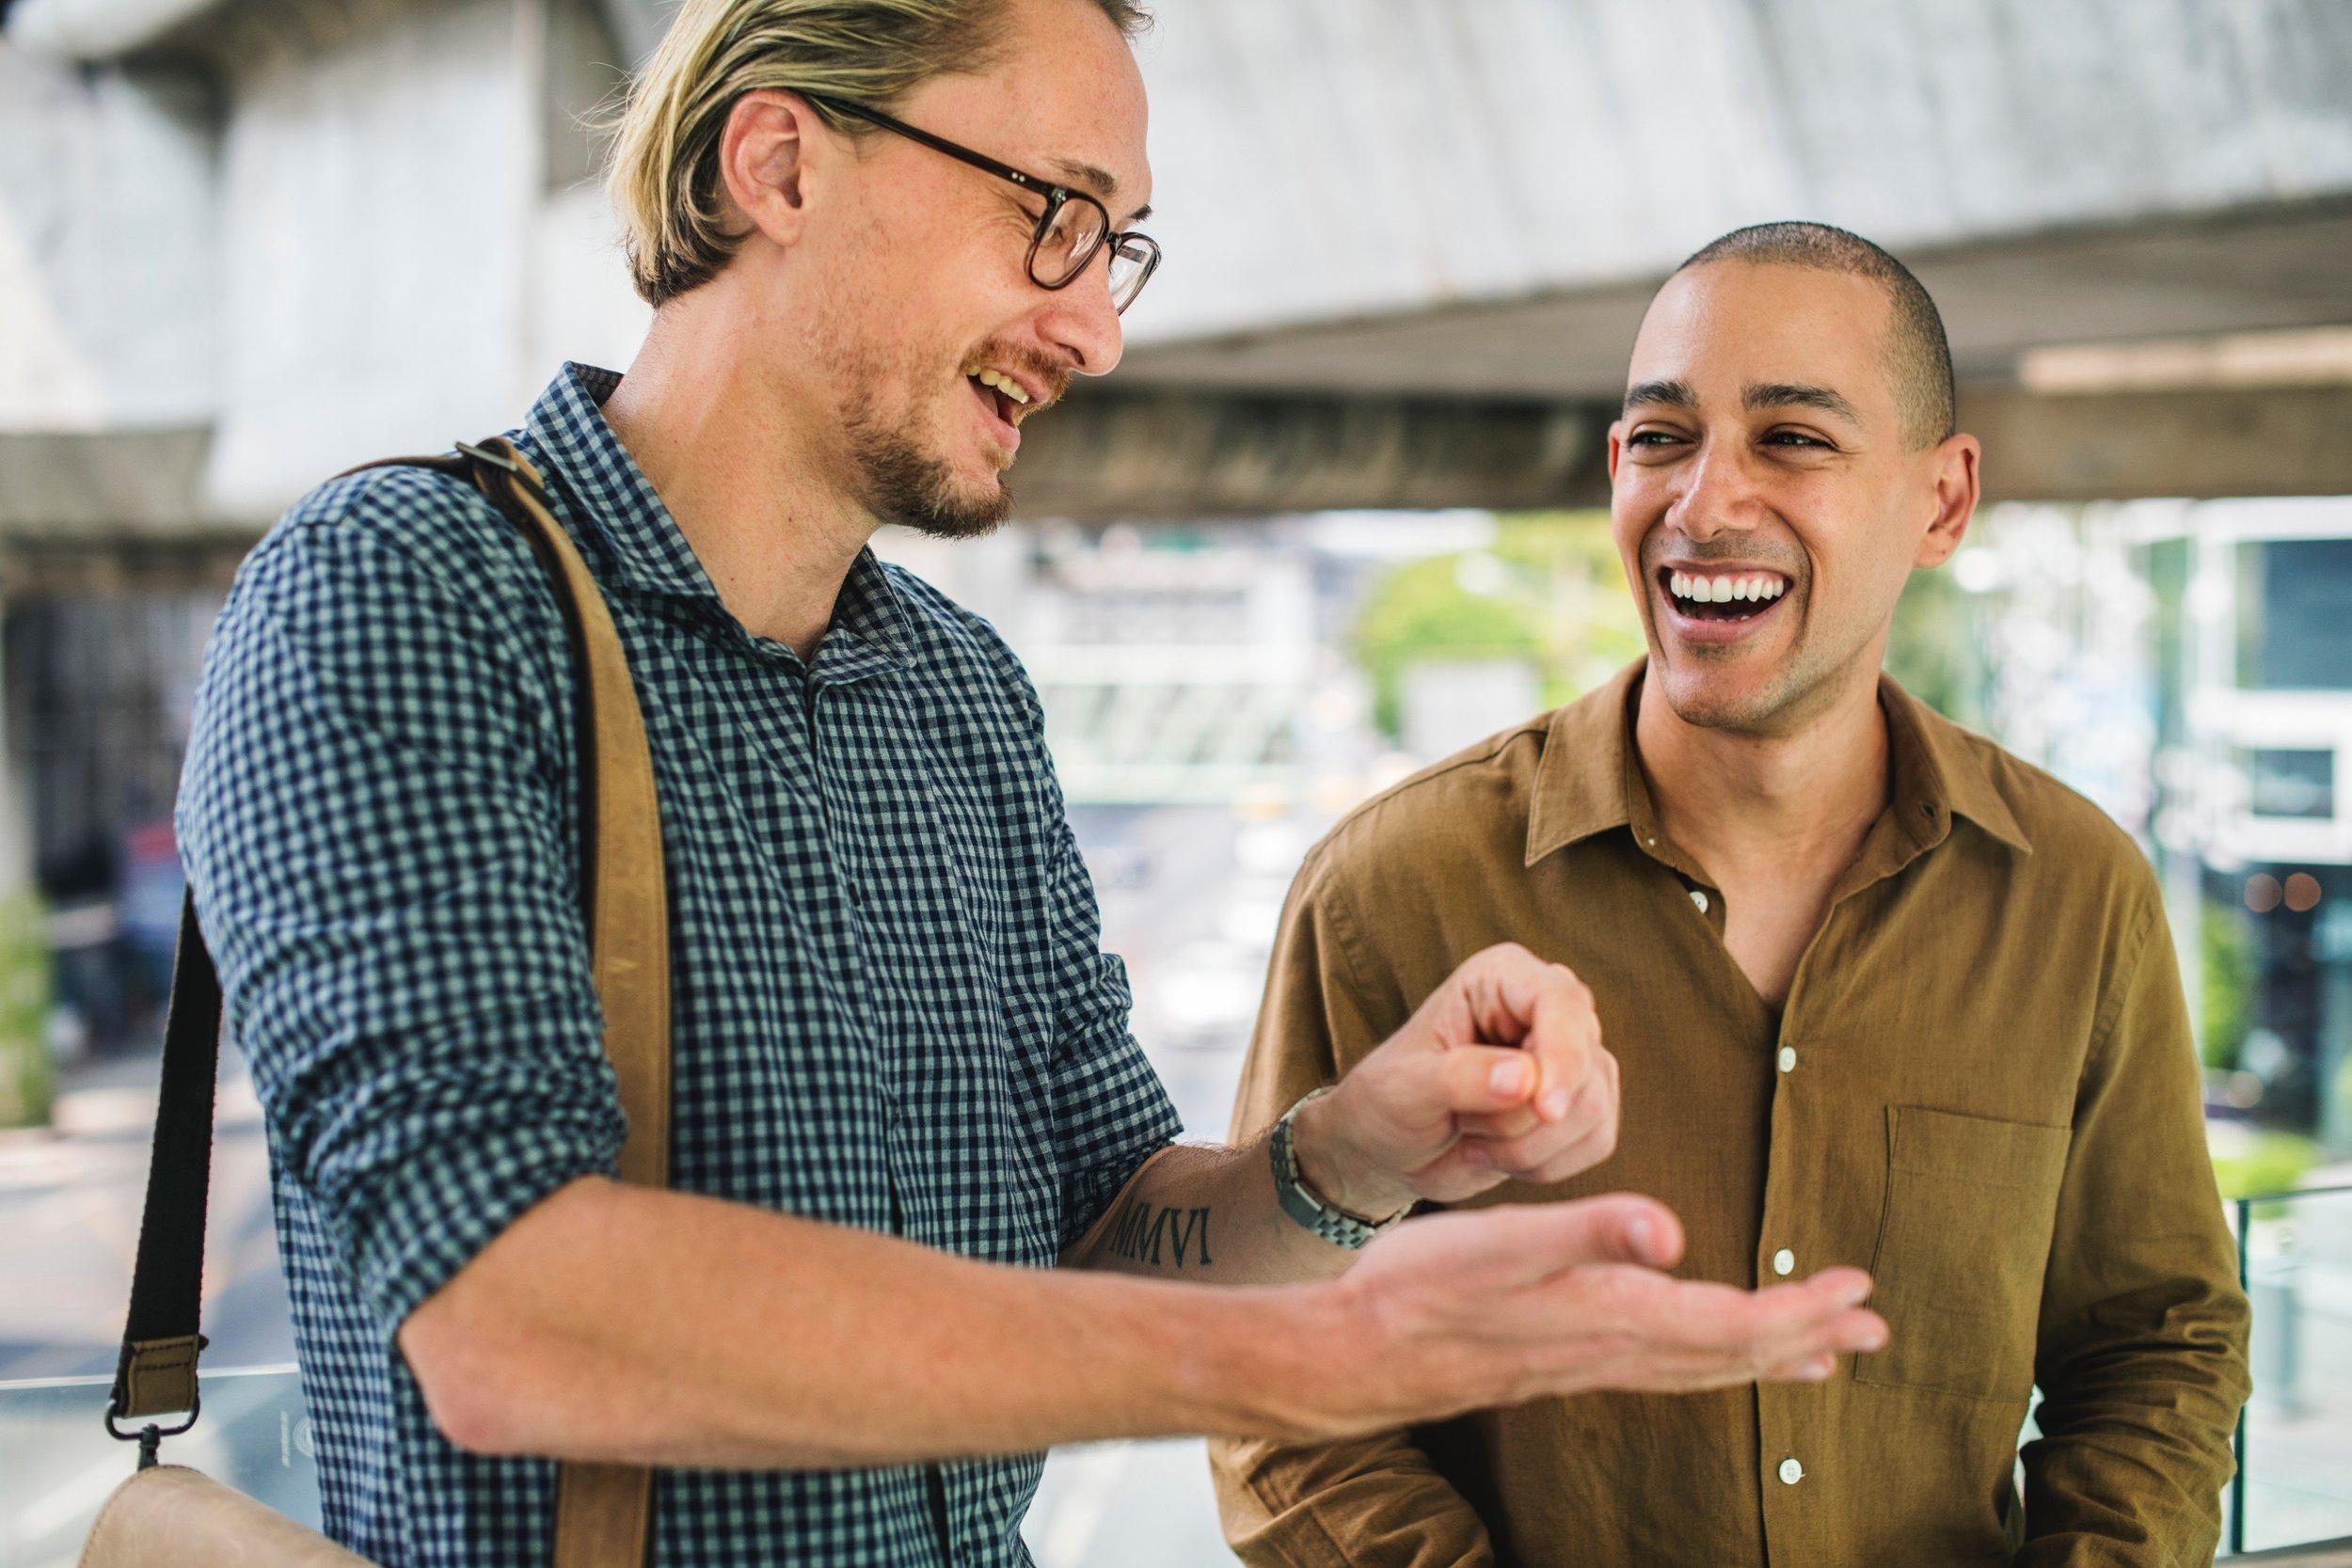 Two Men Talking rawpixel-674079-unsplash.jpg